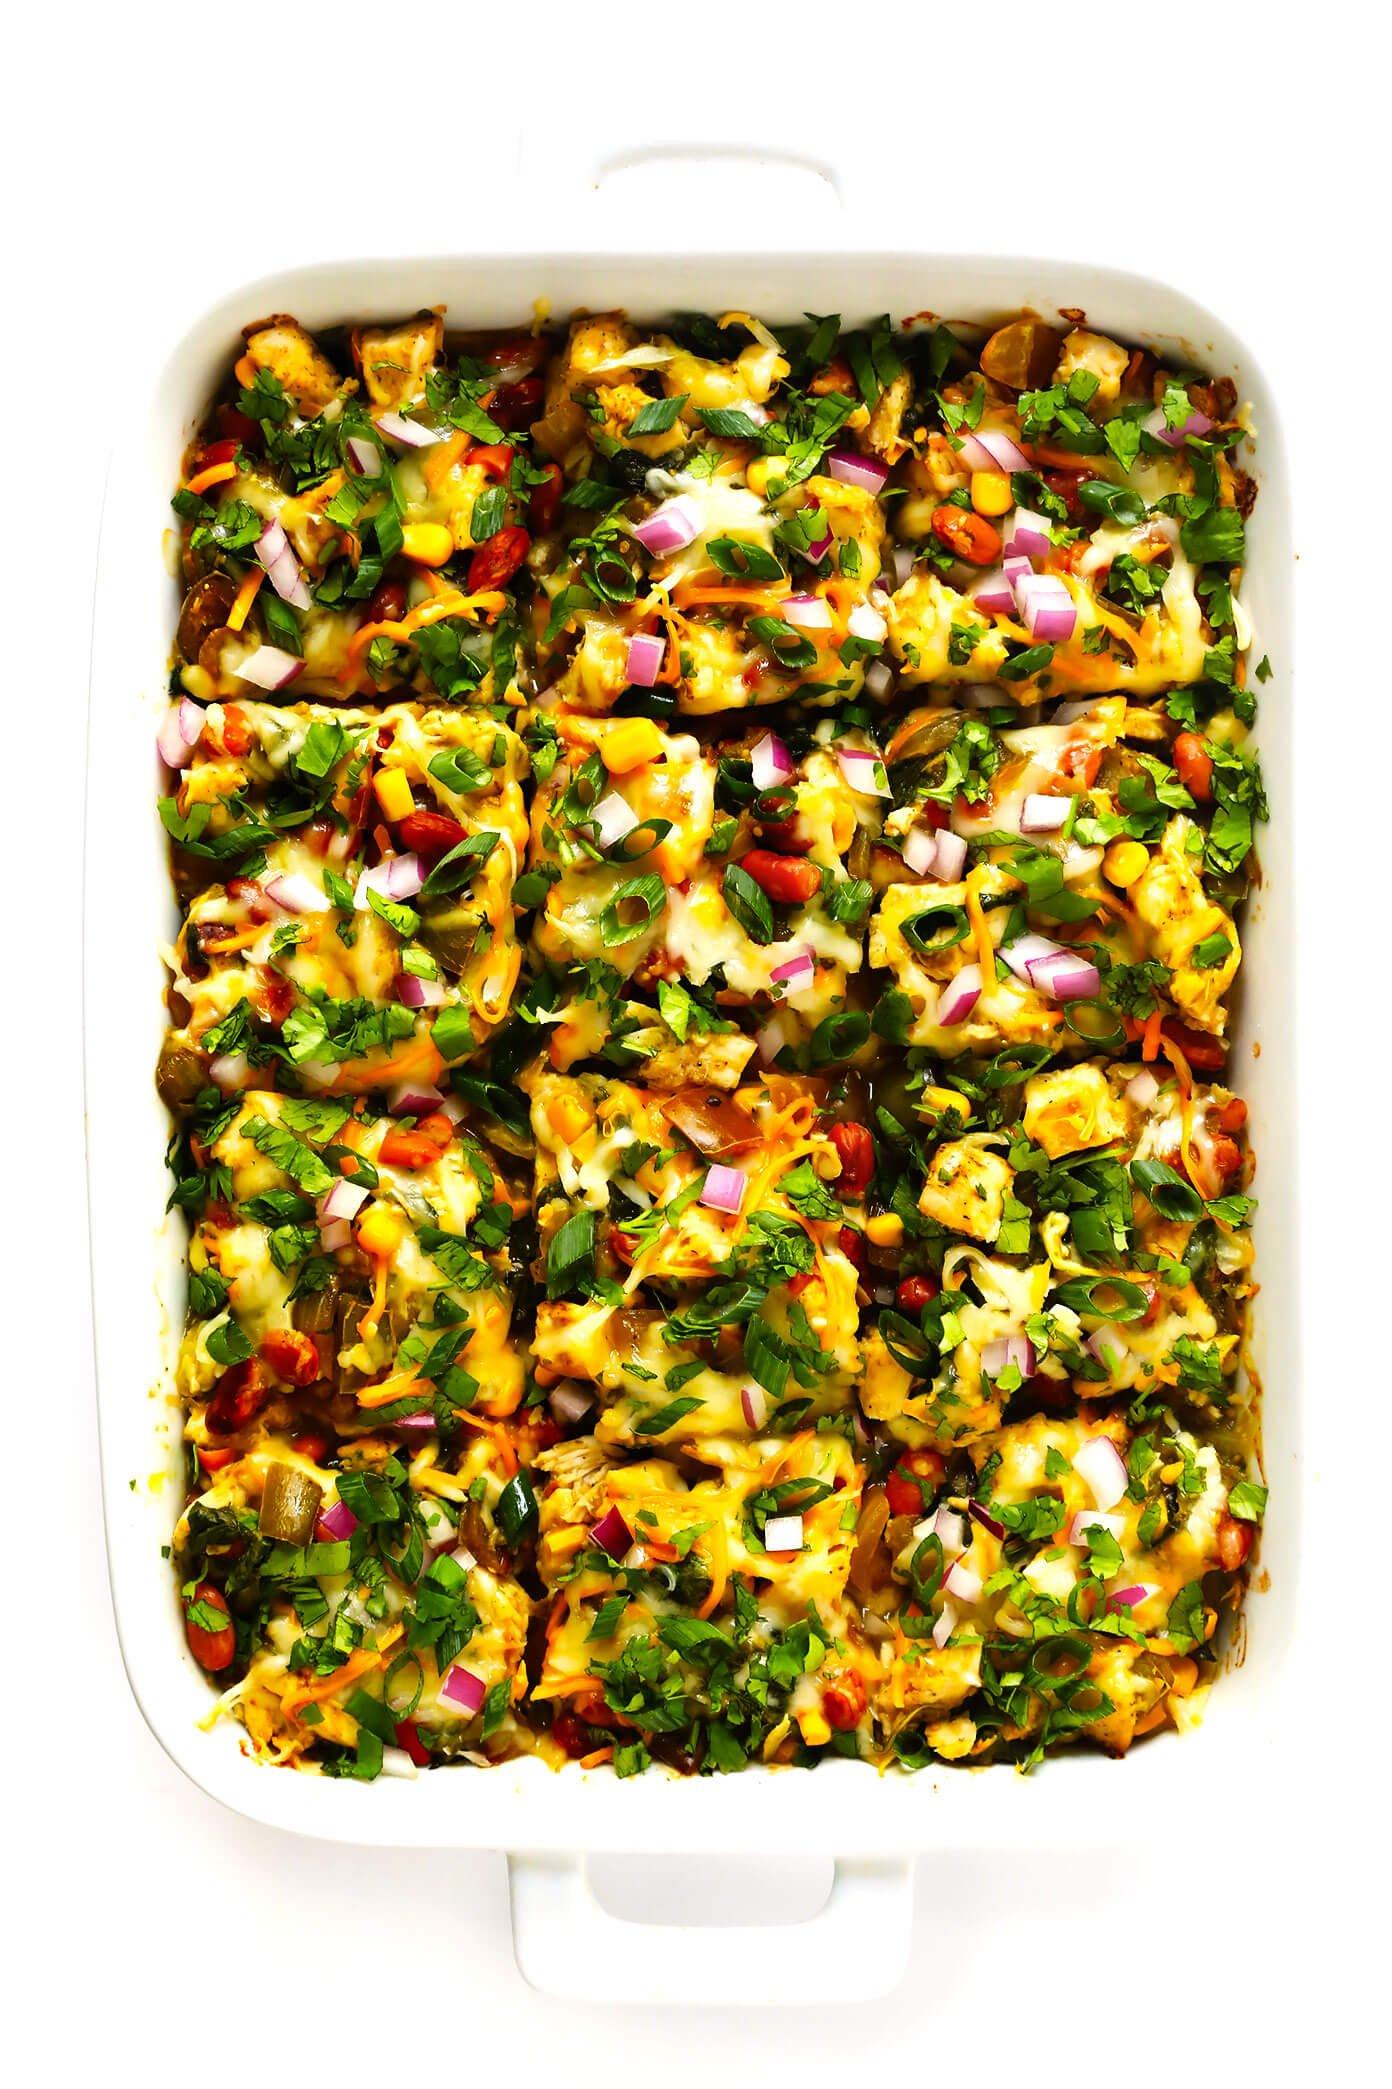 Green Chicken Enchilada Casserole Recipe